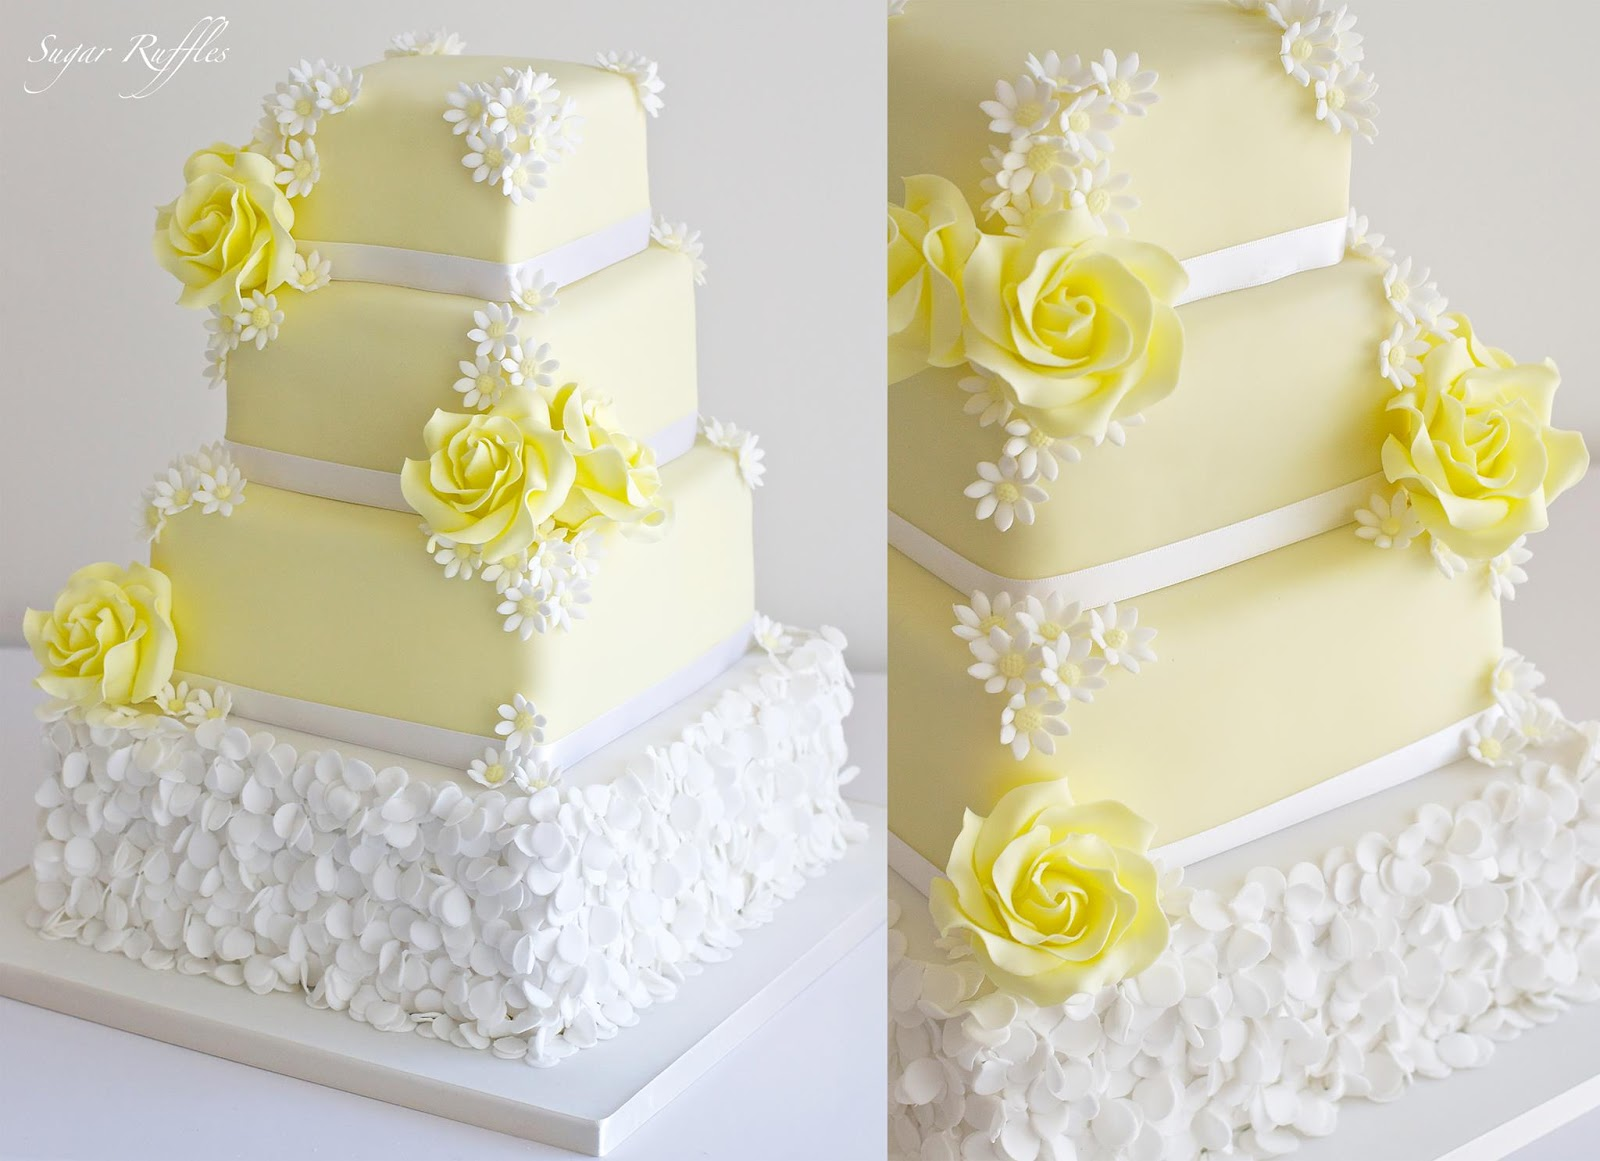 8 Yellow Square Wedding Cakes With Roses Photo - Square Wedding Cake ...